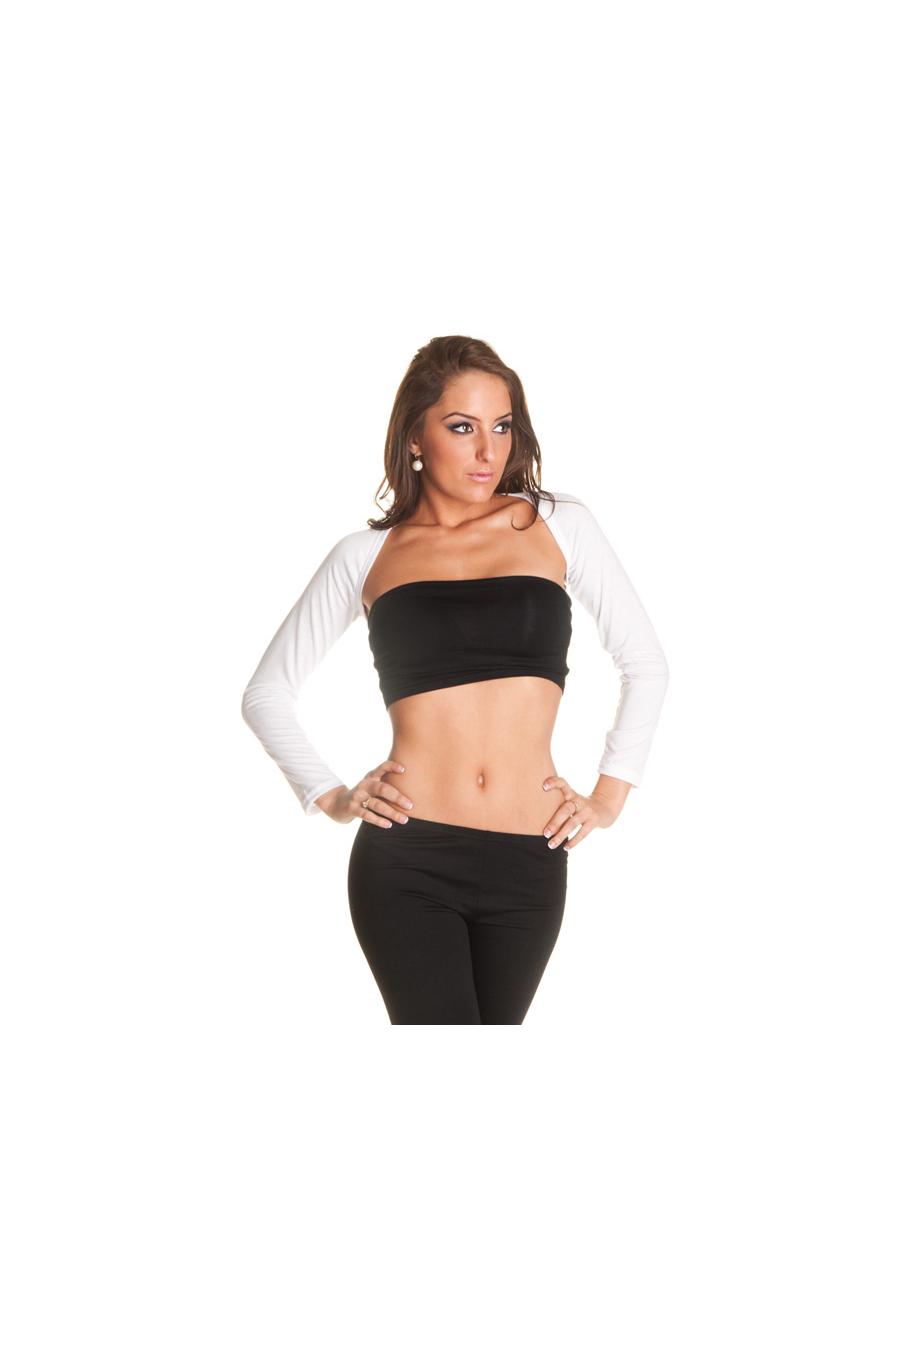 Very fashionable and cheap women's bolero. Fashion clothing for women